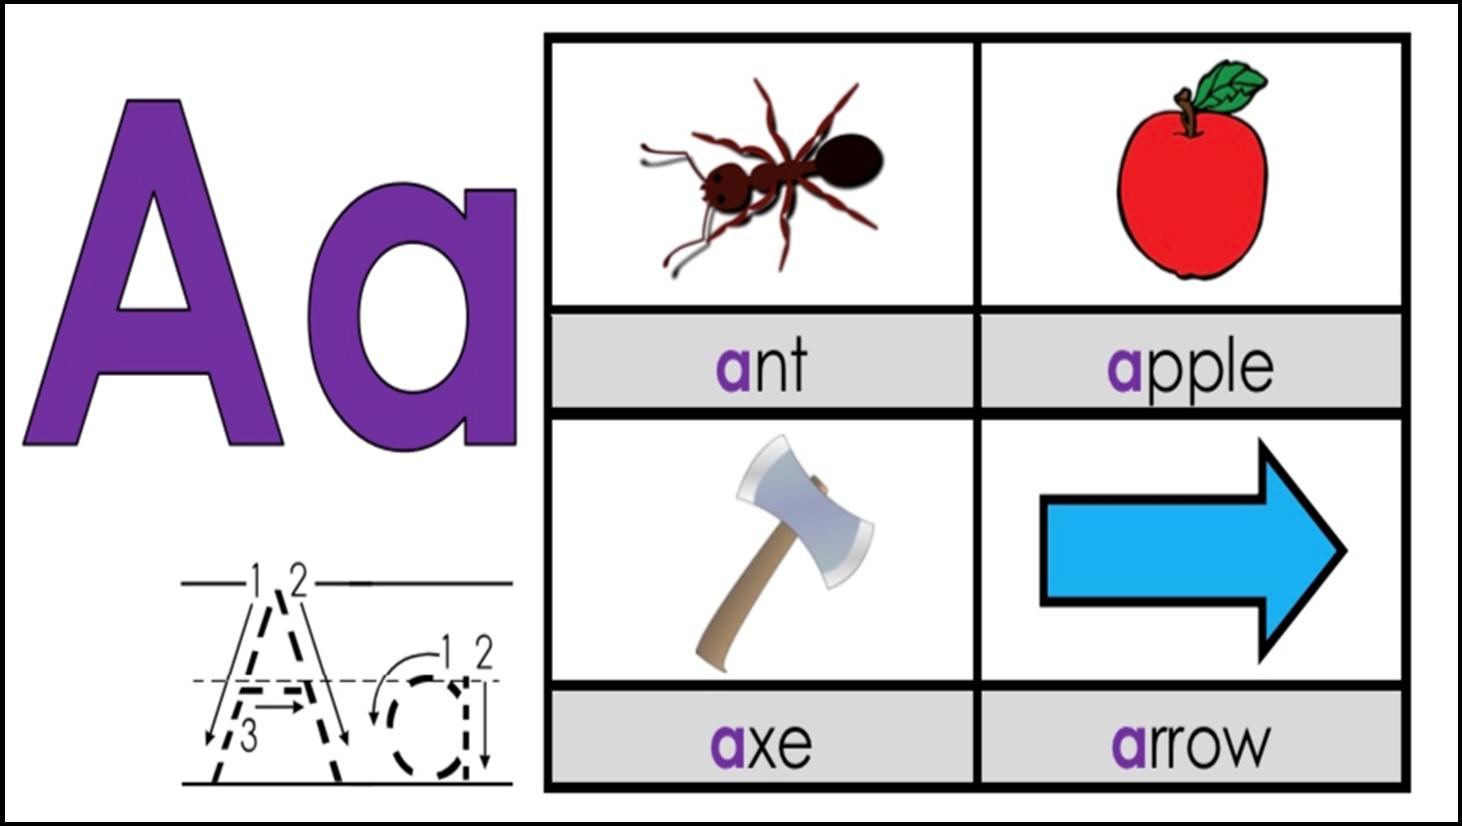 Alphabet Picture الحروف الانجليزية الصف الاول مادة اللغة الانجليزية بوربوينت Cards Playing Cards Apple